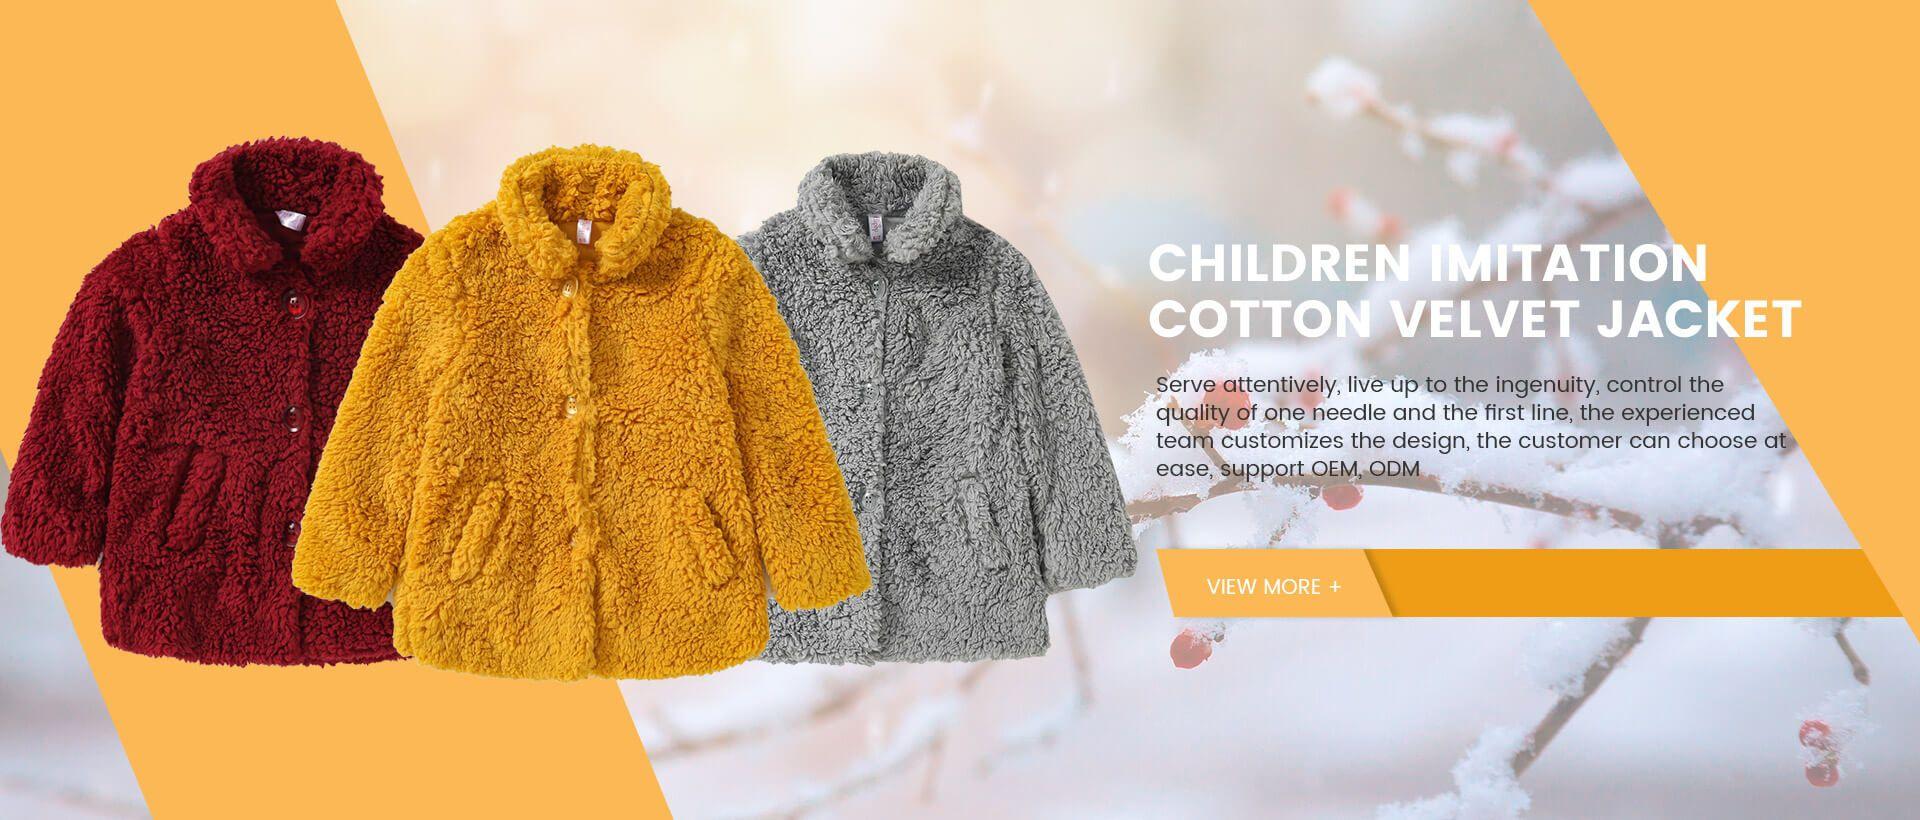 Children Imitation Cotton Velvet Jacket